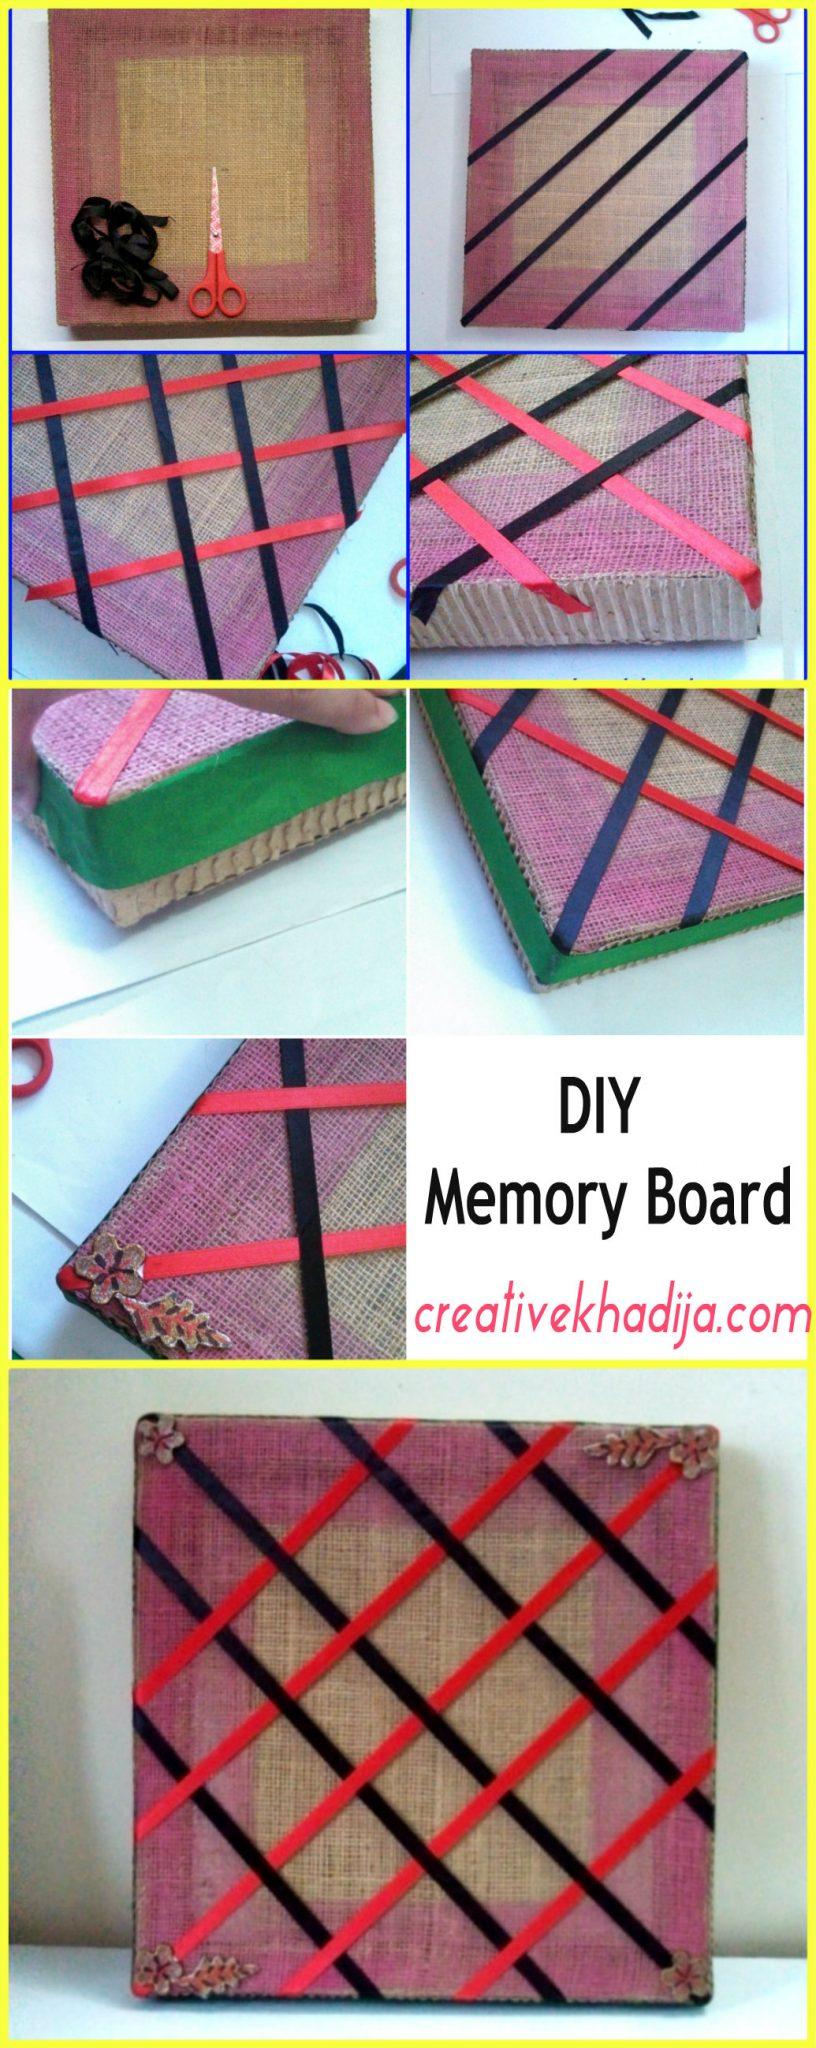 diy-reminder-memory-board-ideas